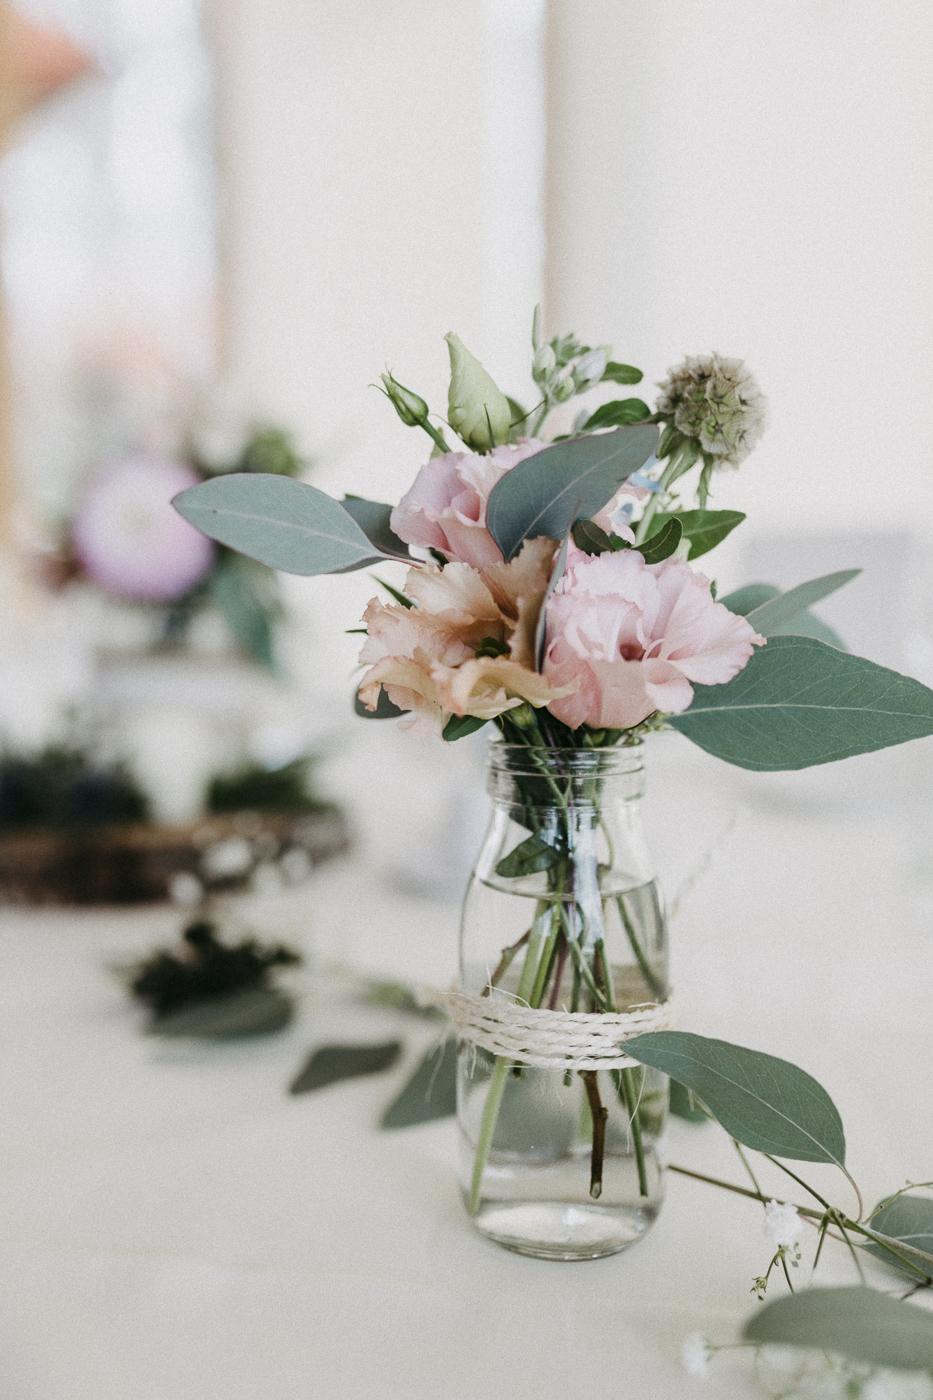 rosemarrylemon_ND_Hochzeit_Hochzeitsplanung24.jpg